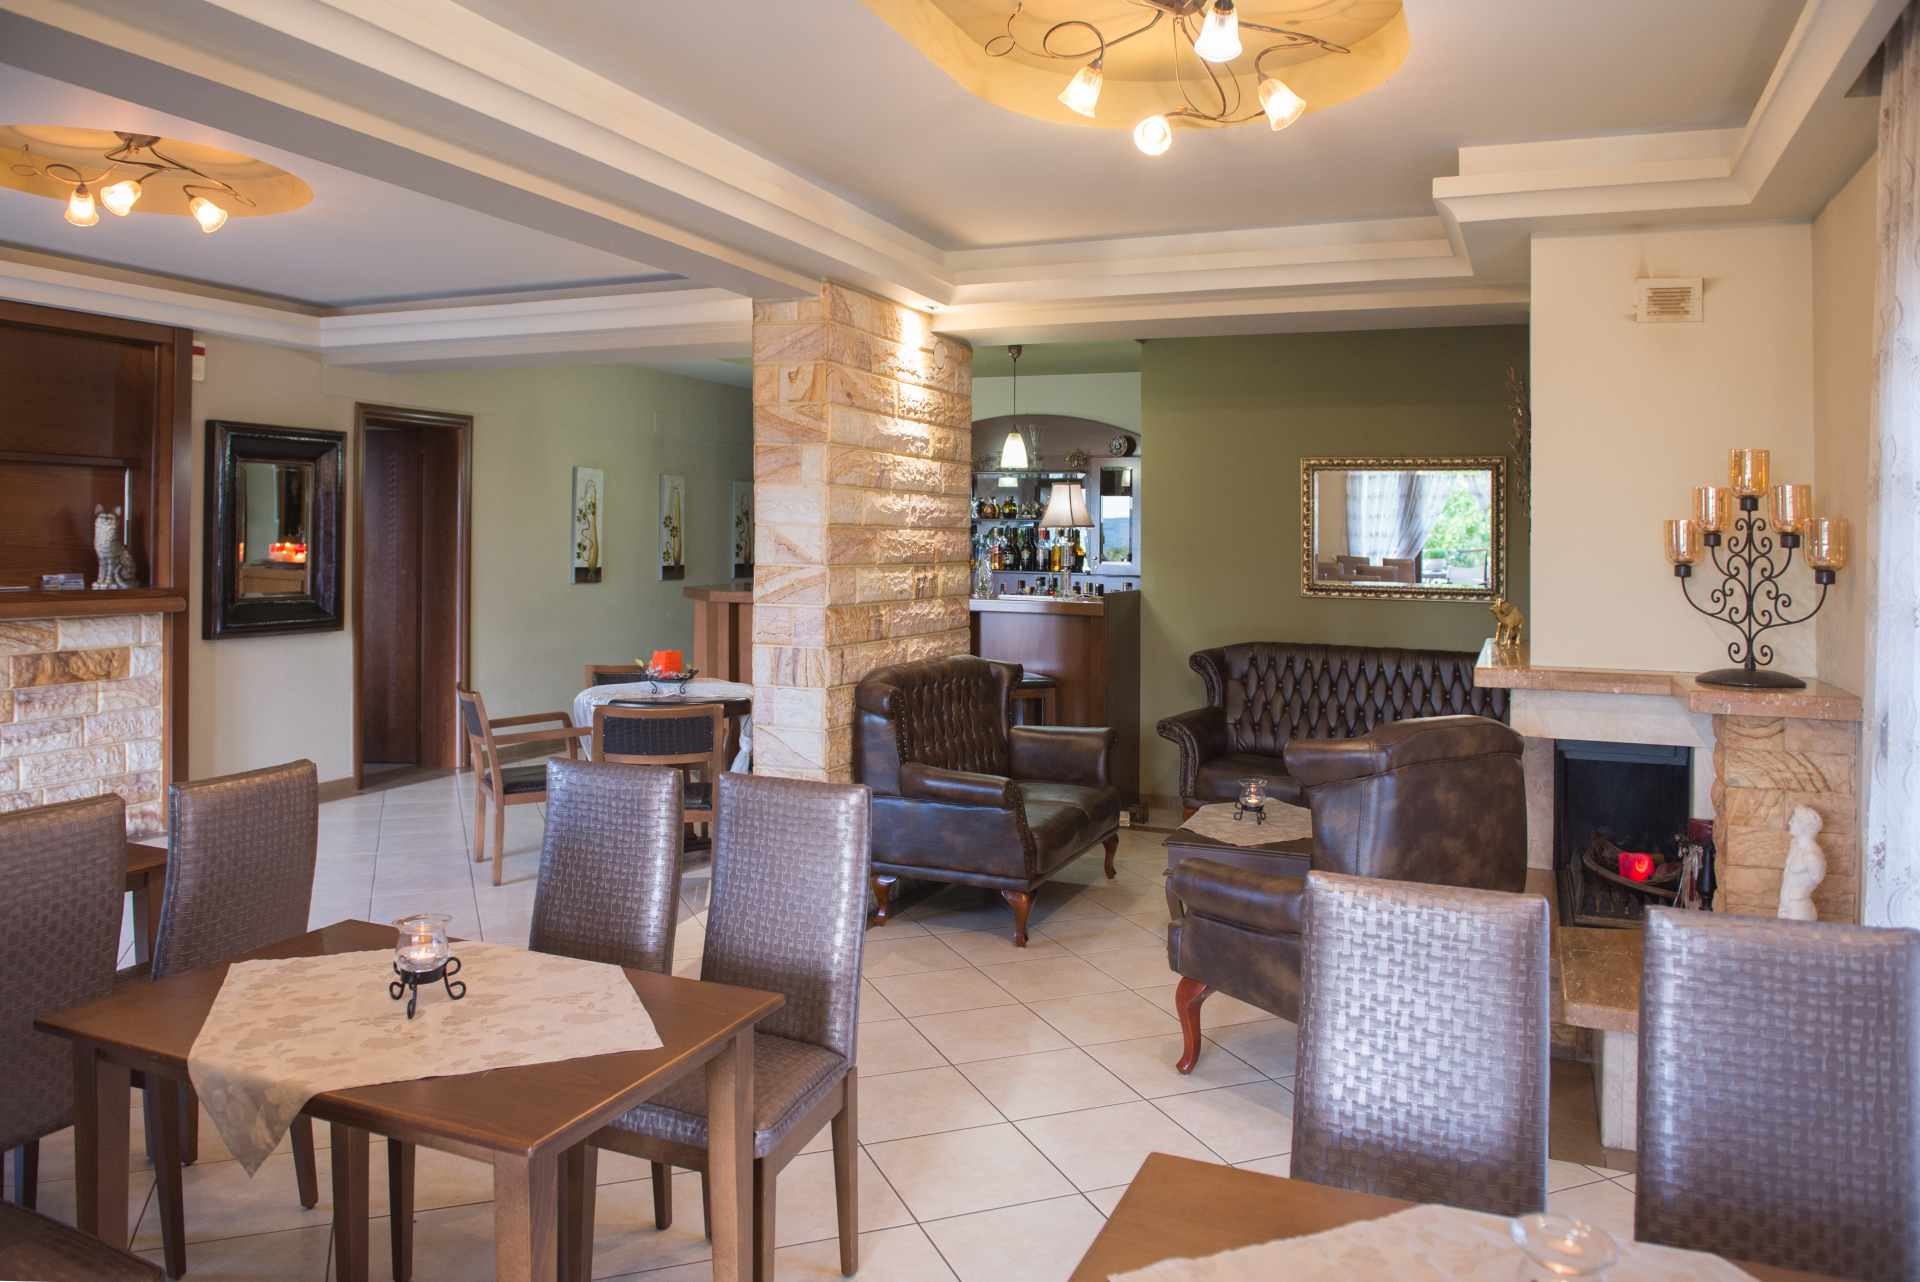 Philippion hotel Lobby